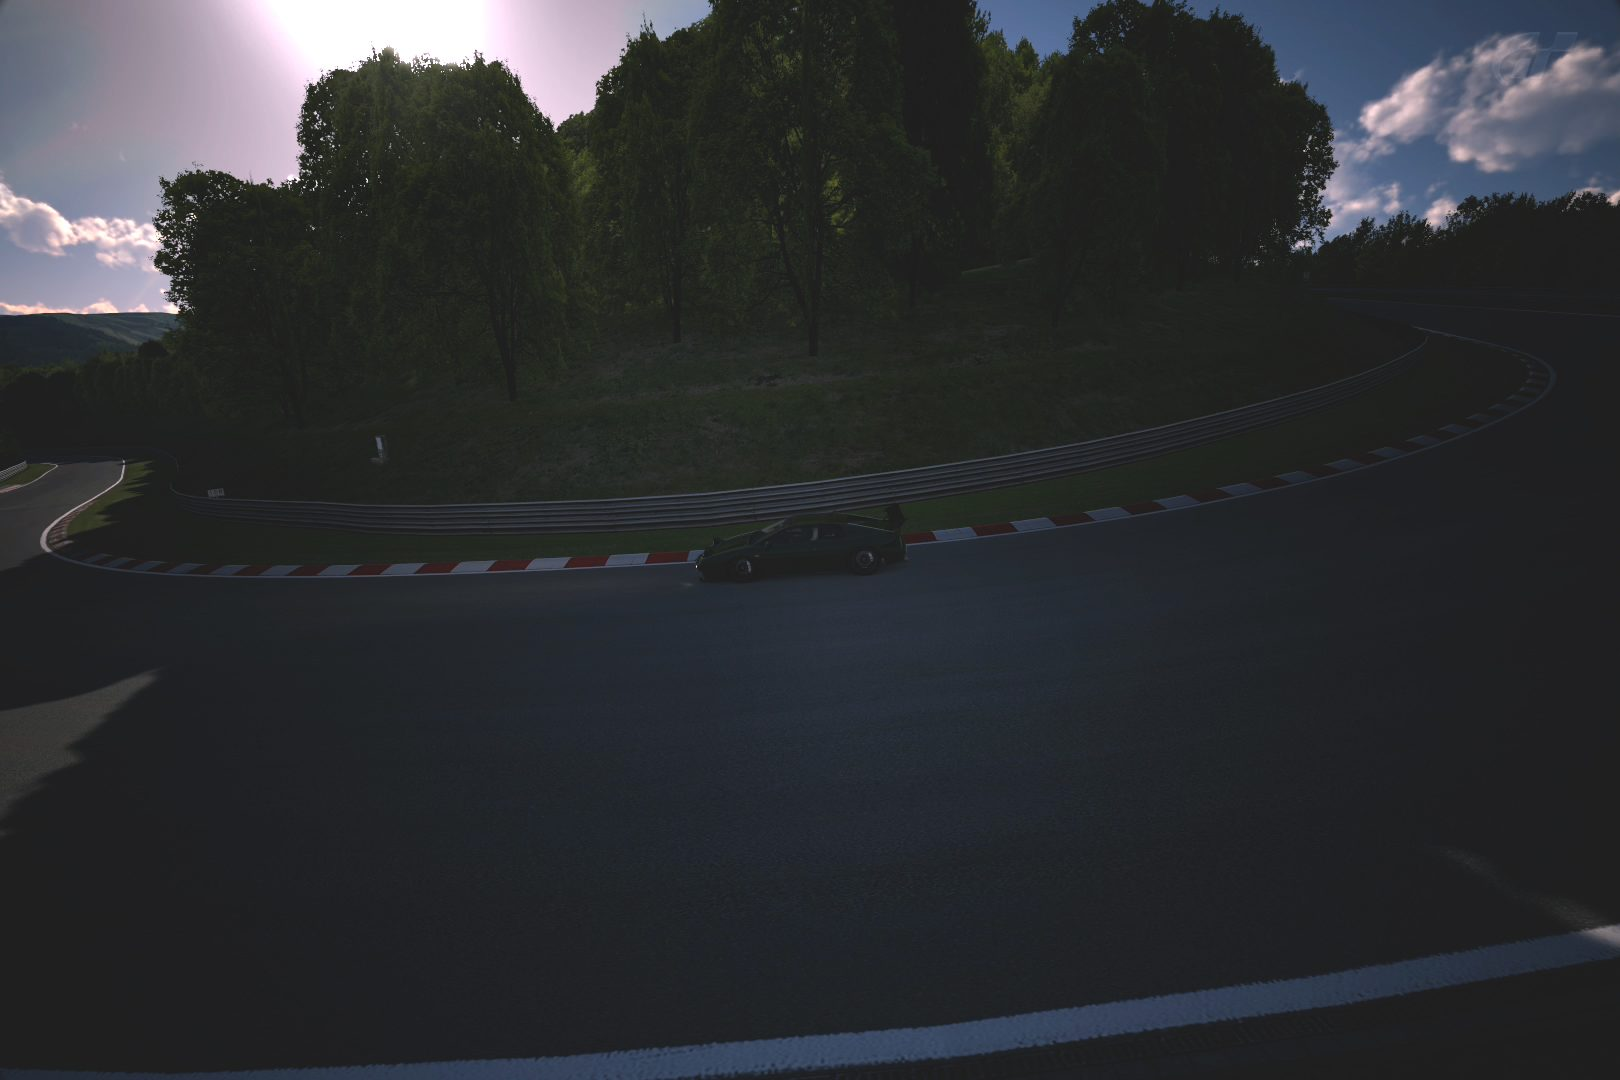 Nürburgring Nordschleife_4 EDITED.jpg